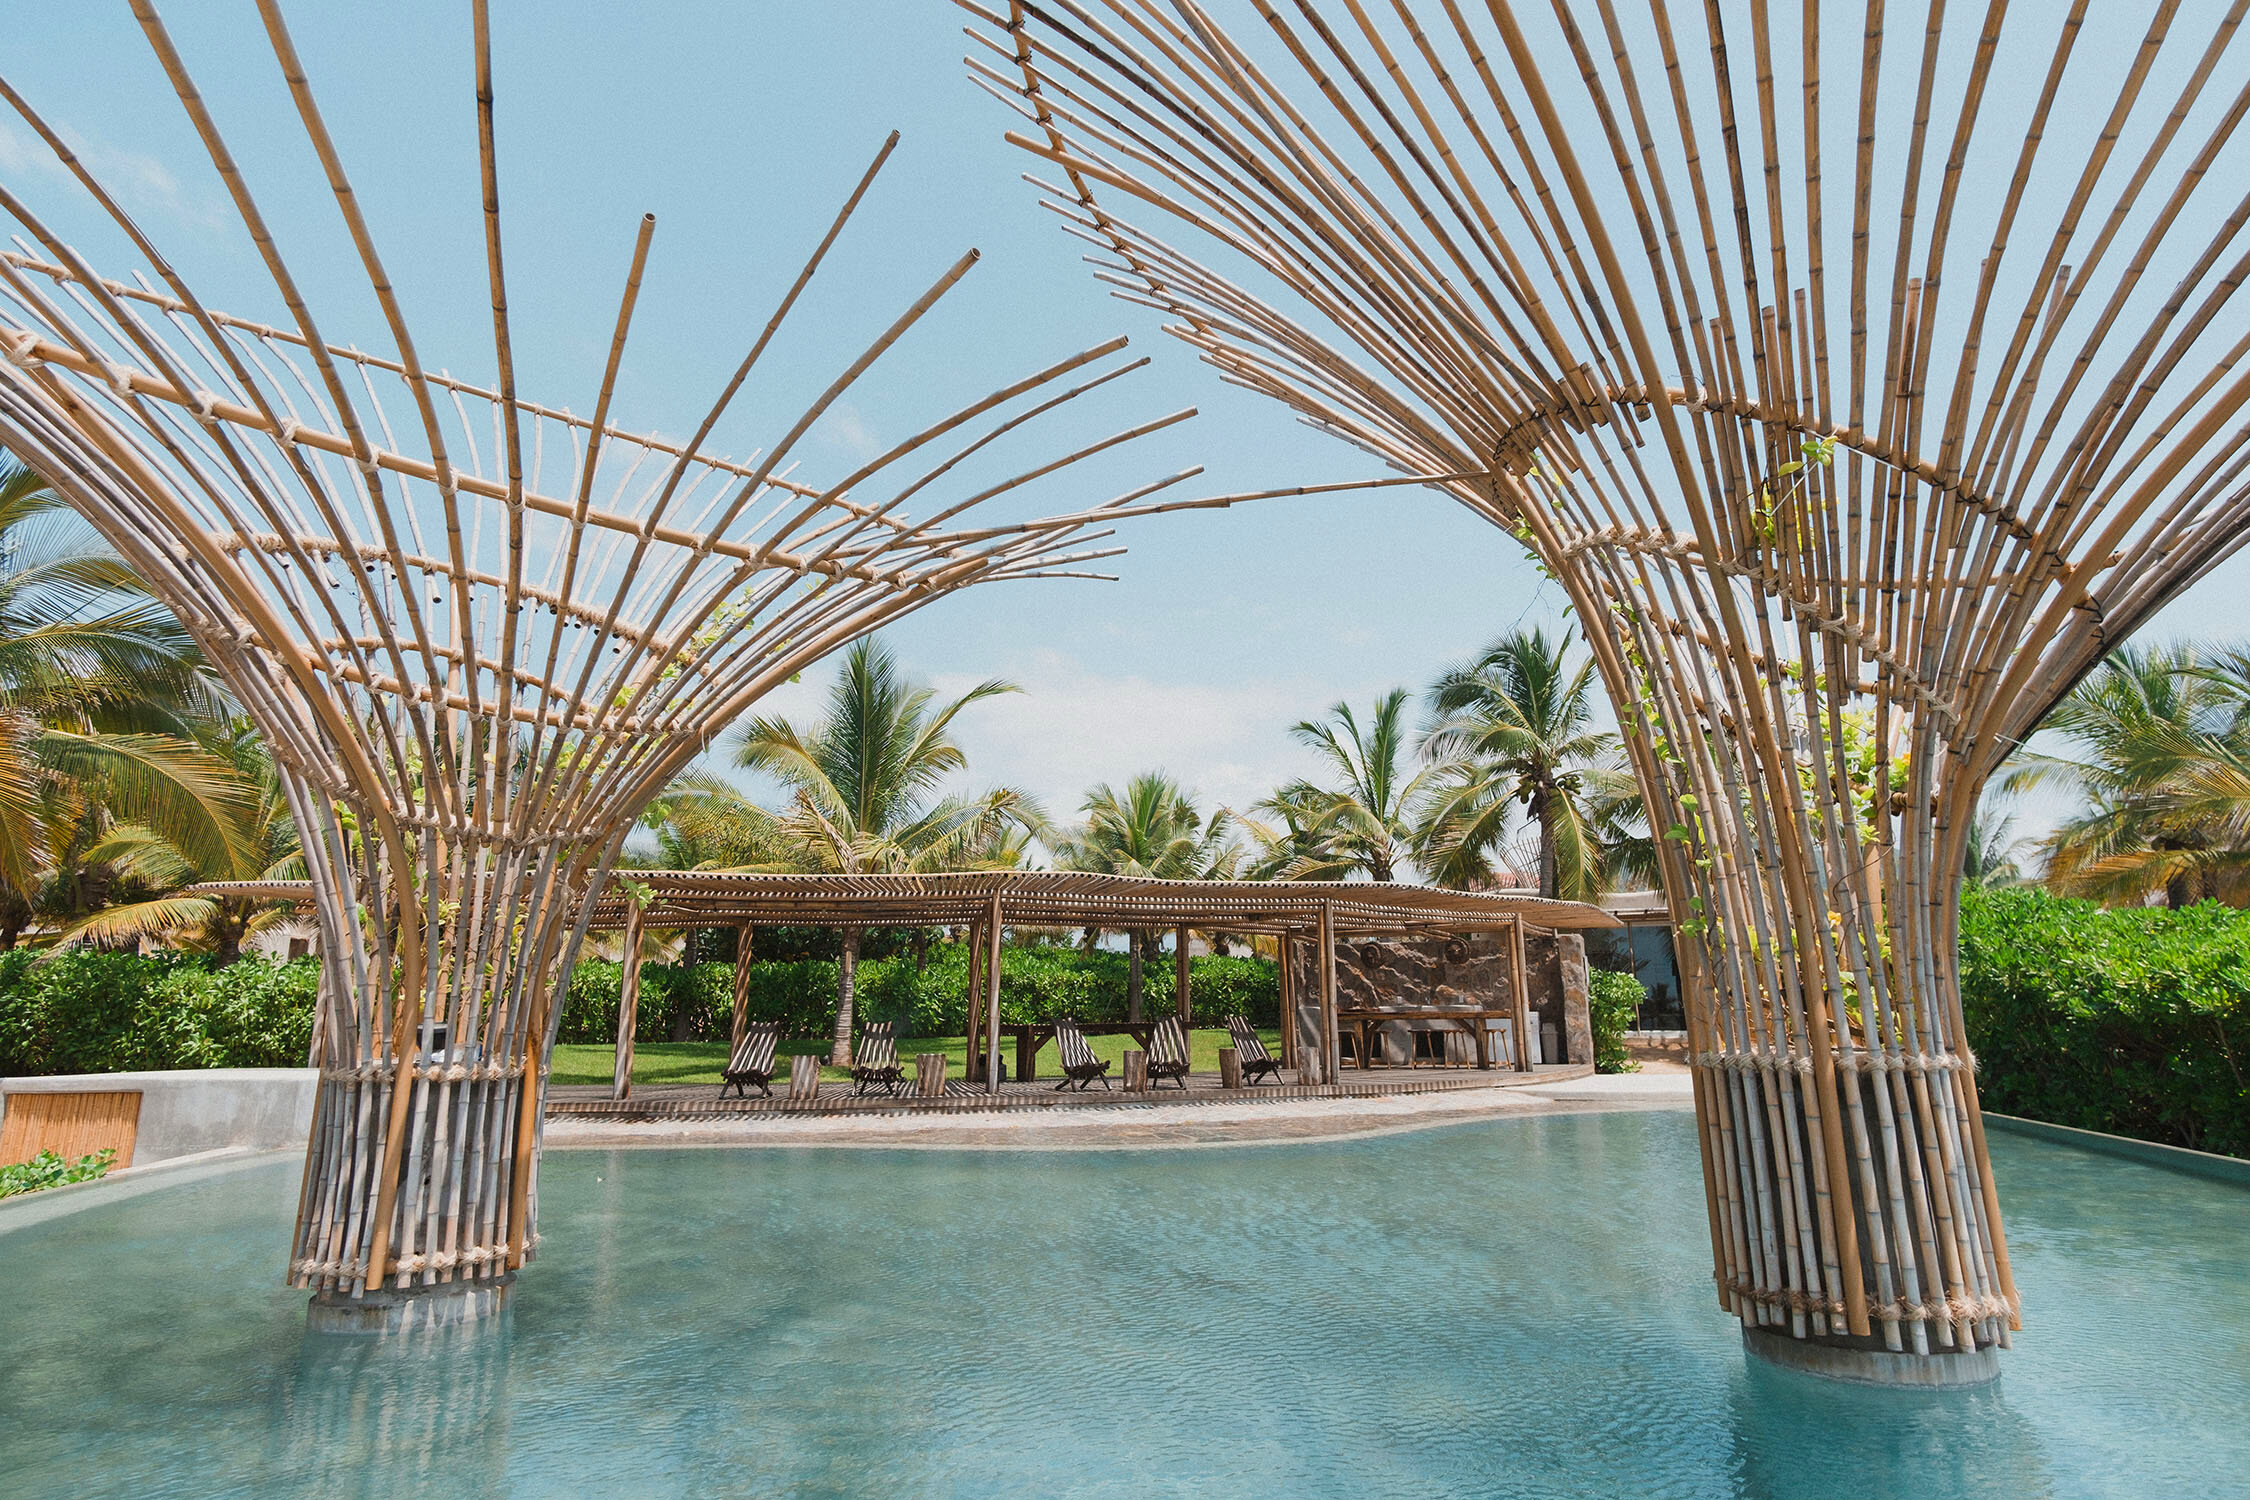 Punta-Majahua-Troncones-Ixtapa-Zihuatanejo-Zozaya-Arquitectos-Fotografia-Heiko-Bothe-9.jpg